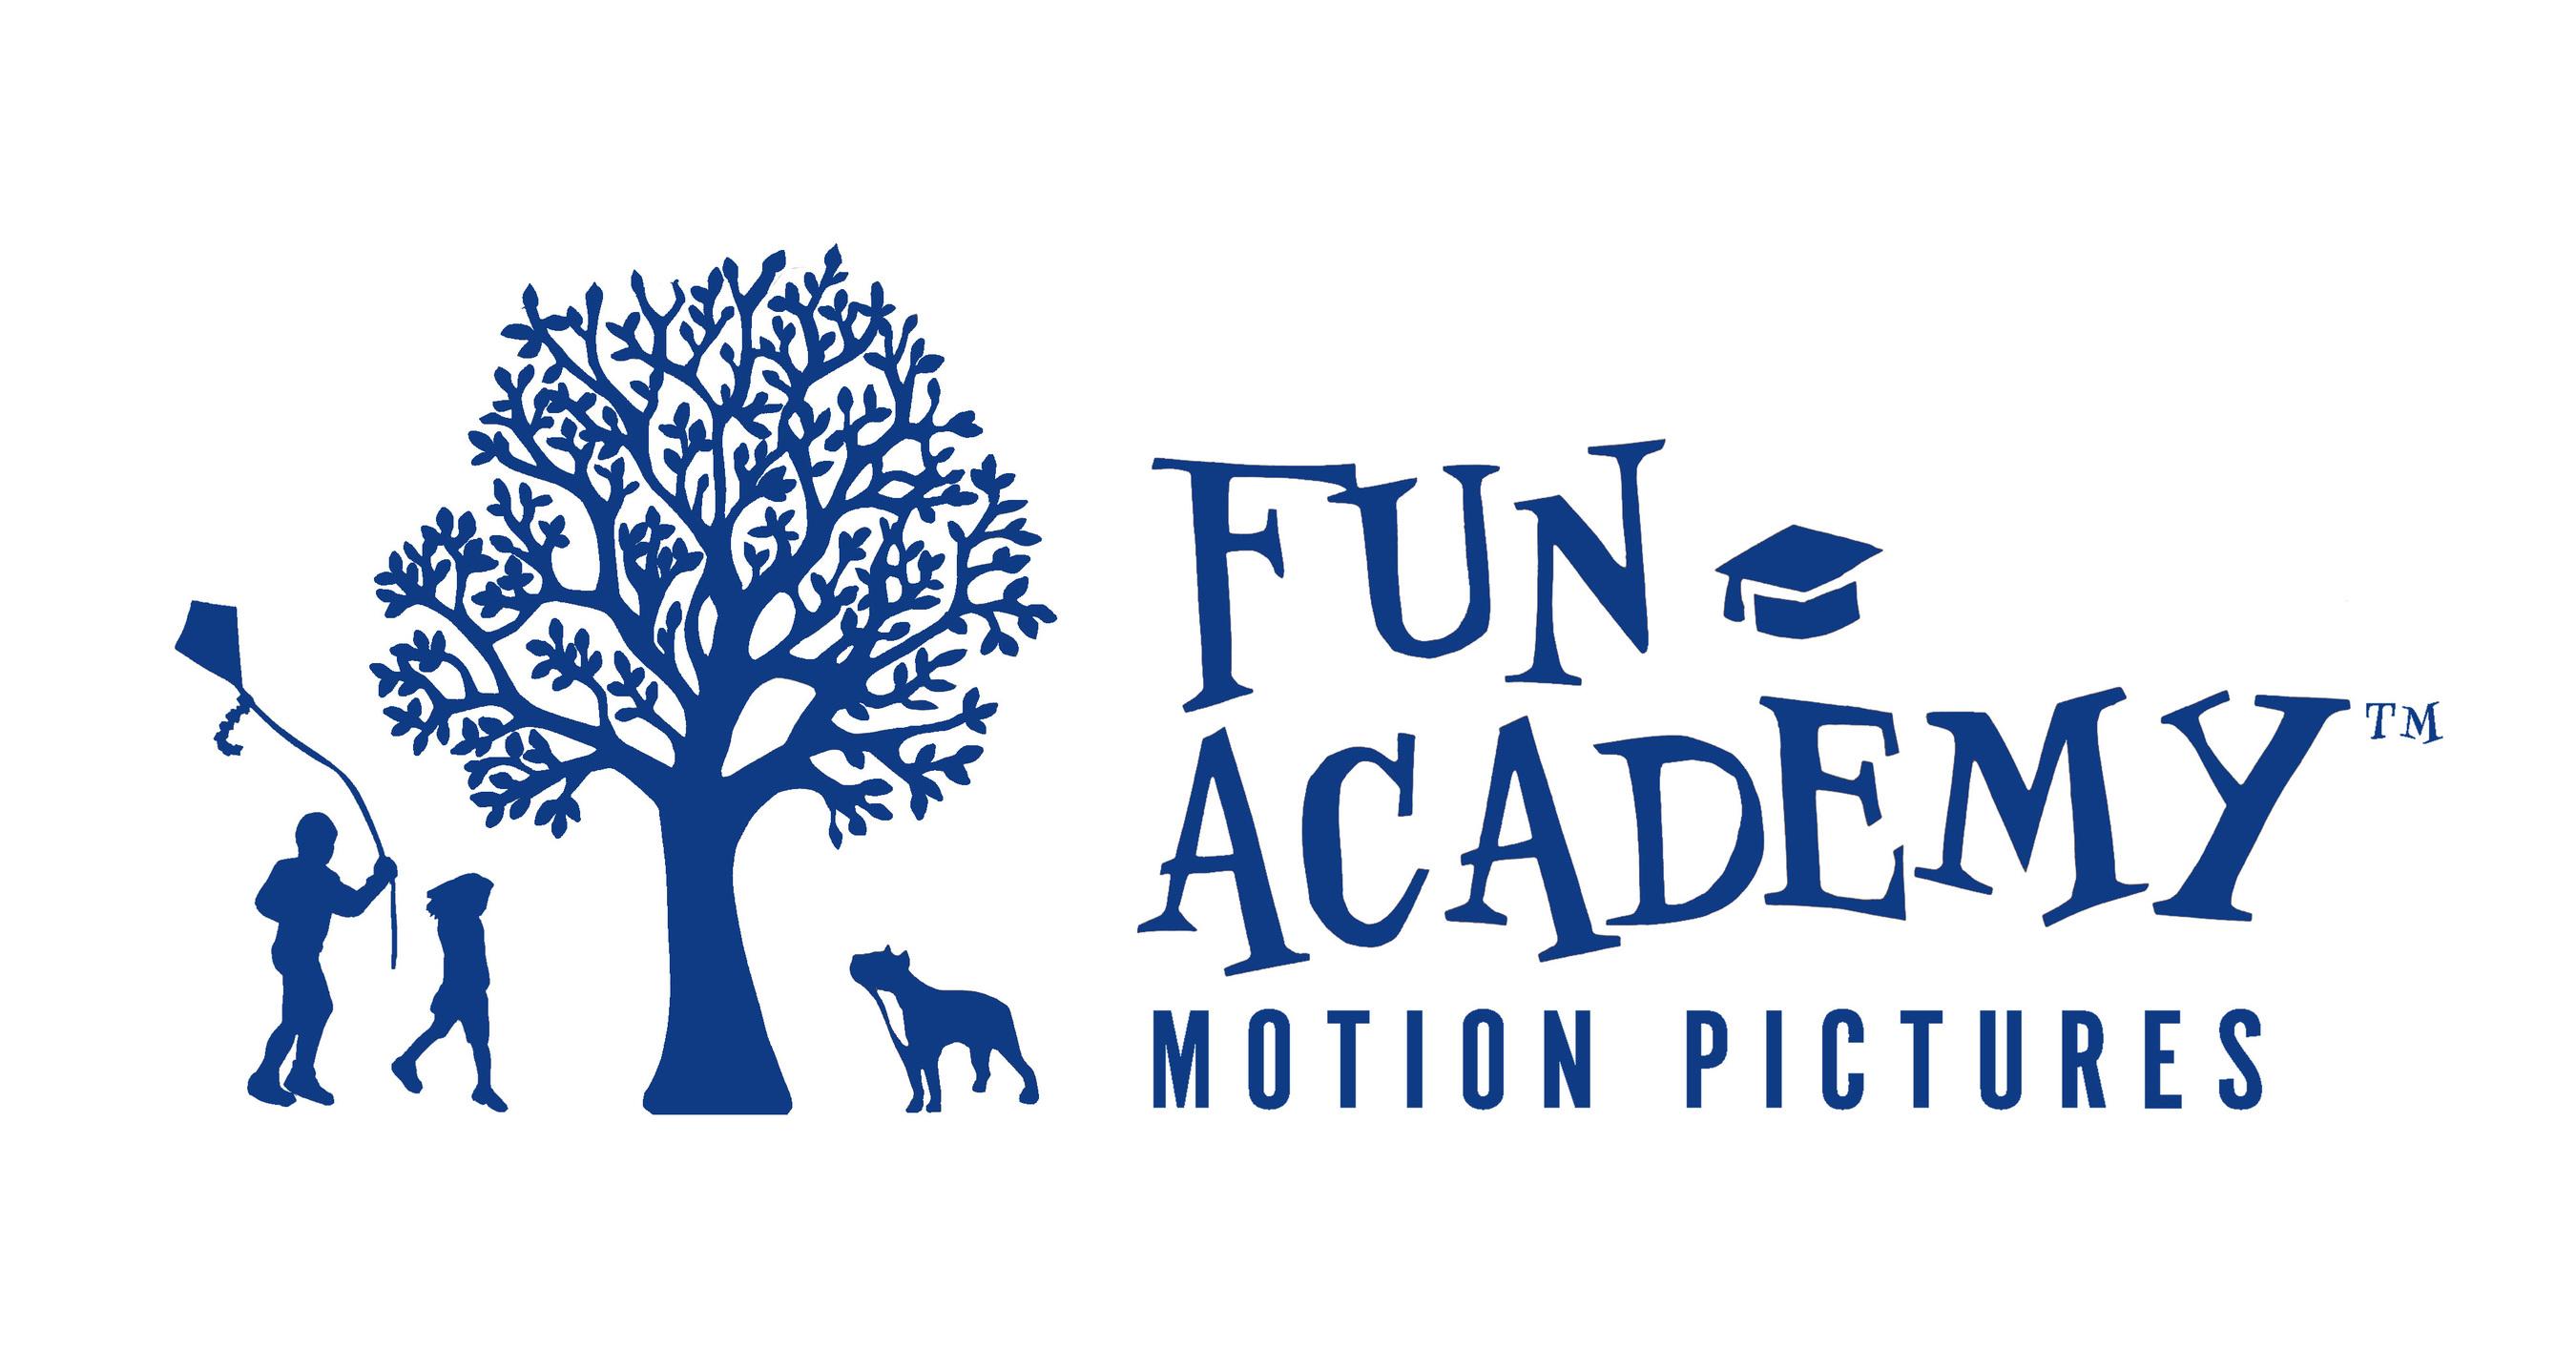 Fun Academy(TM) Motion Pictures Studio